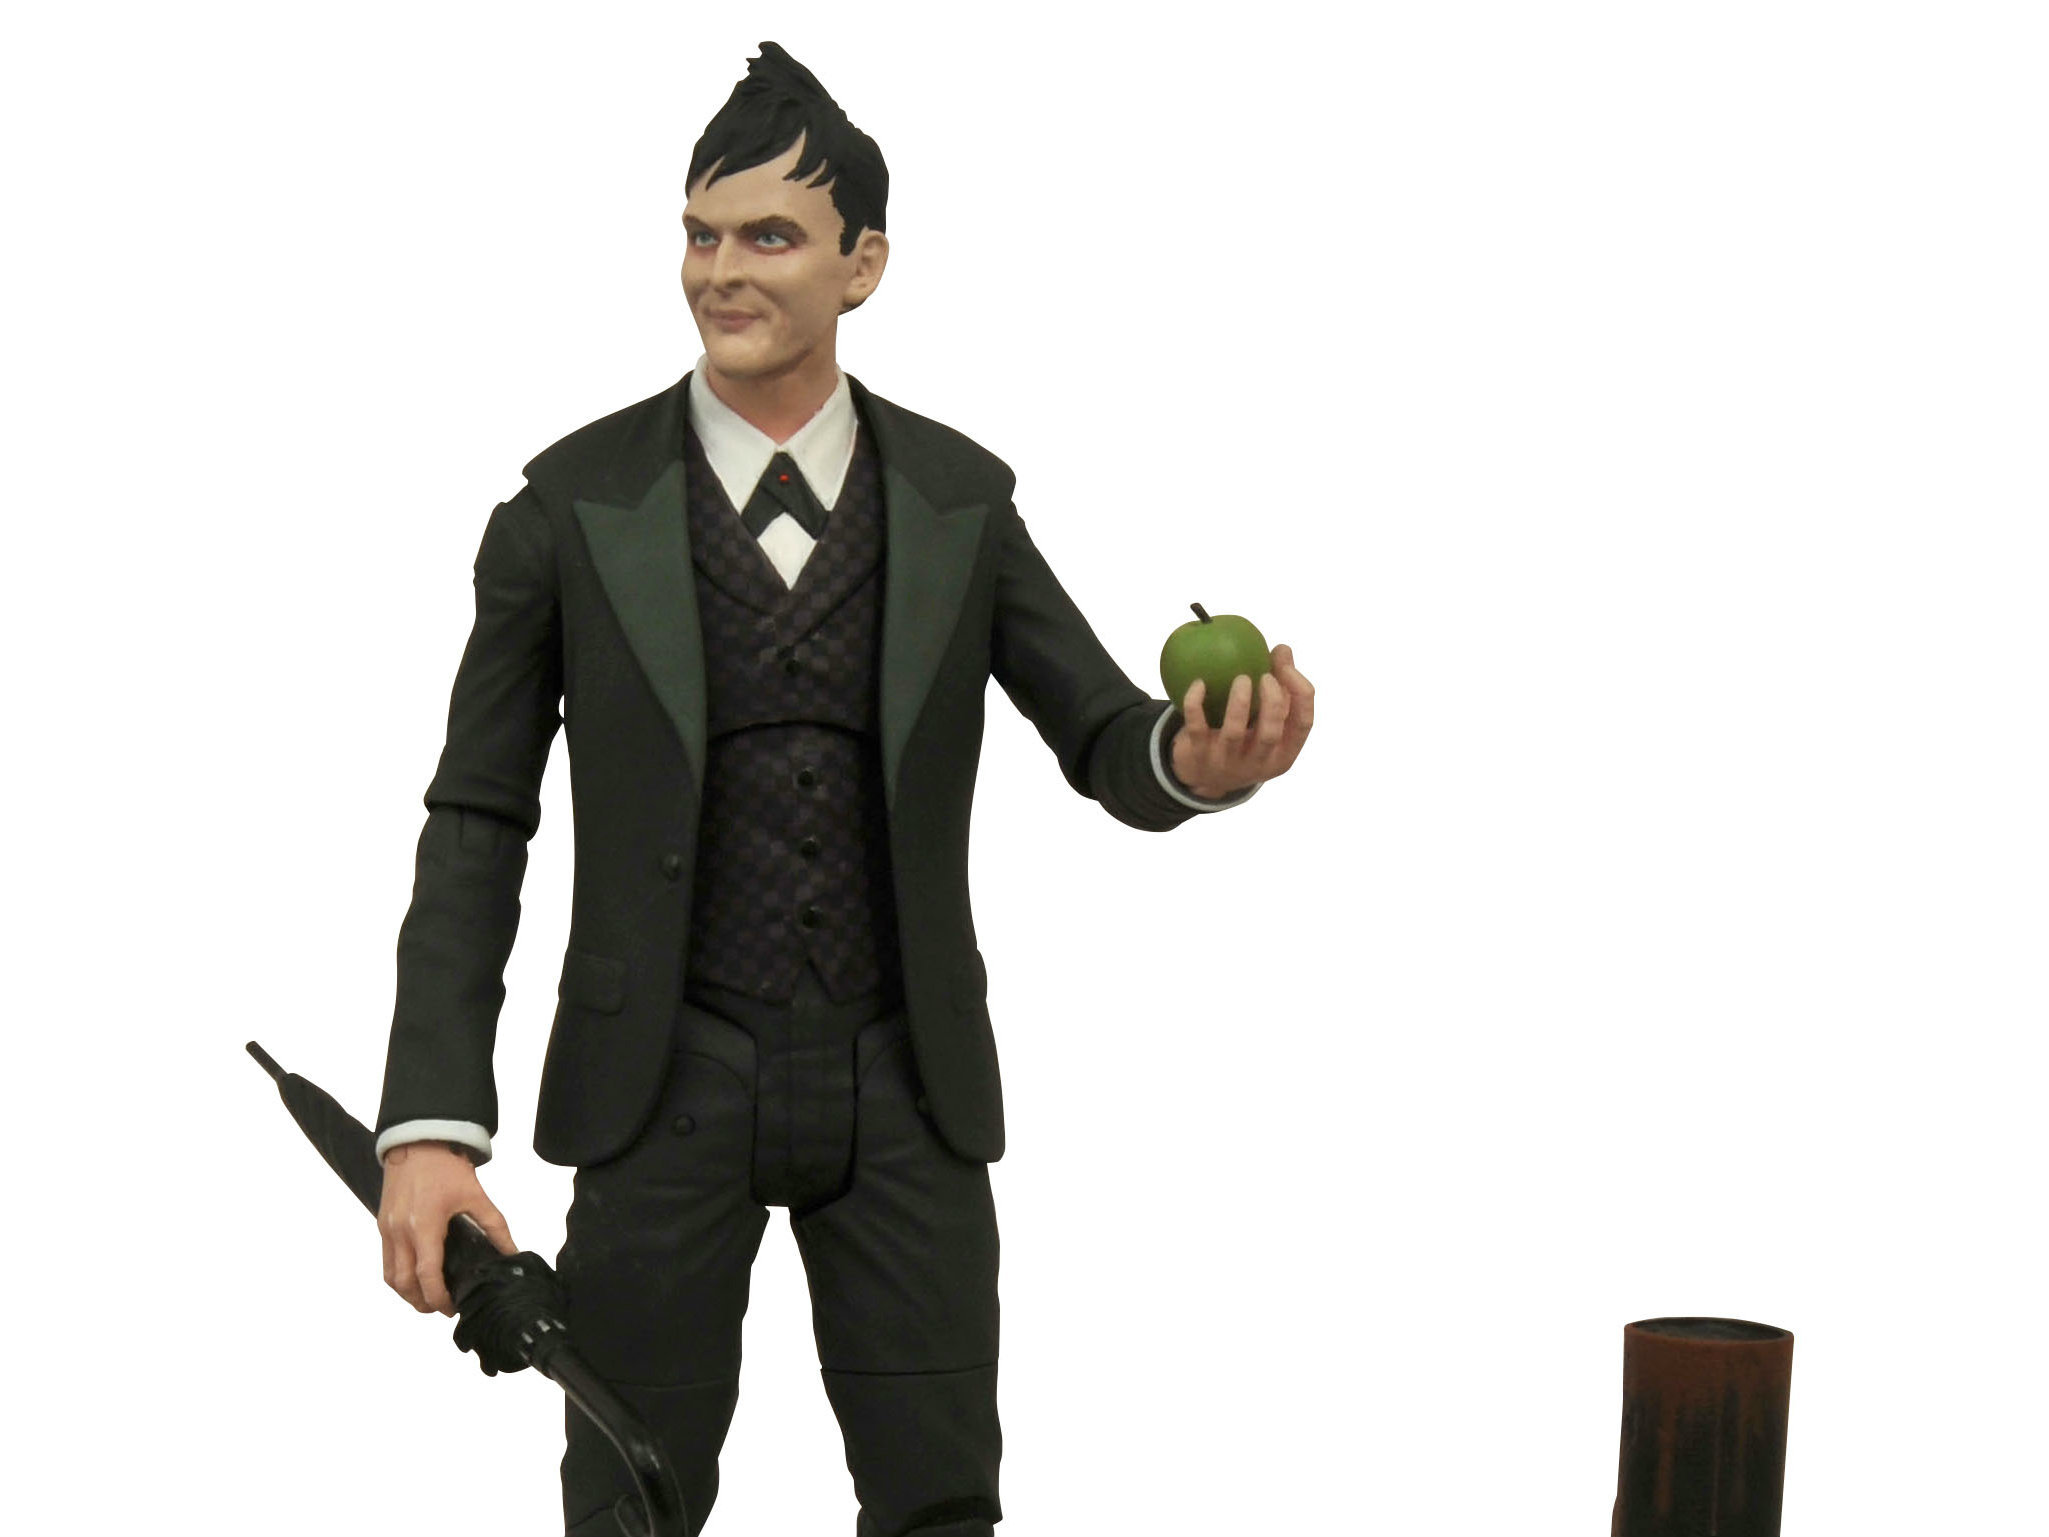 Oswald Cobblepot, de Gotham